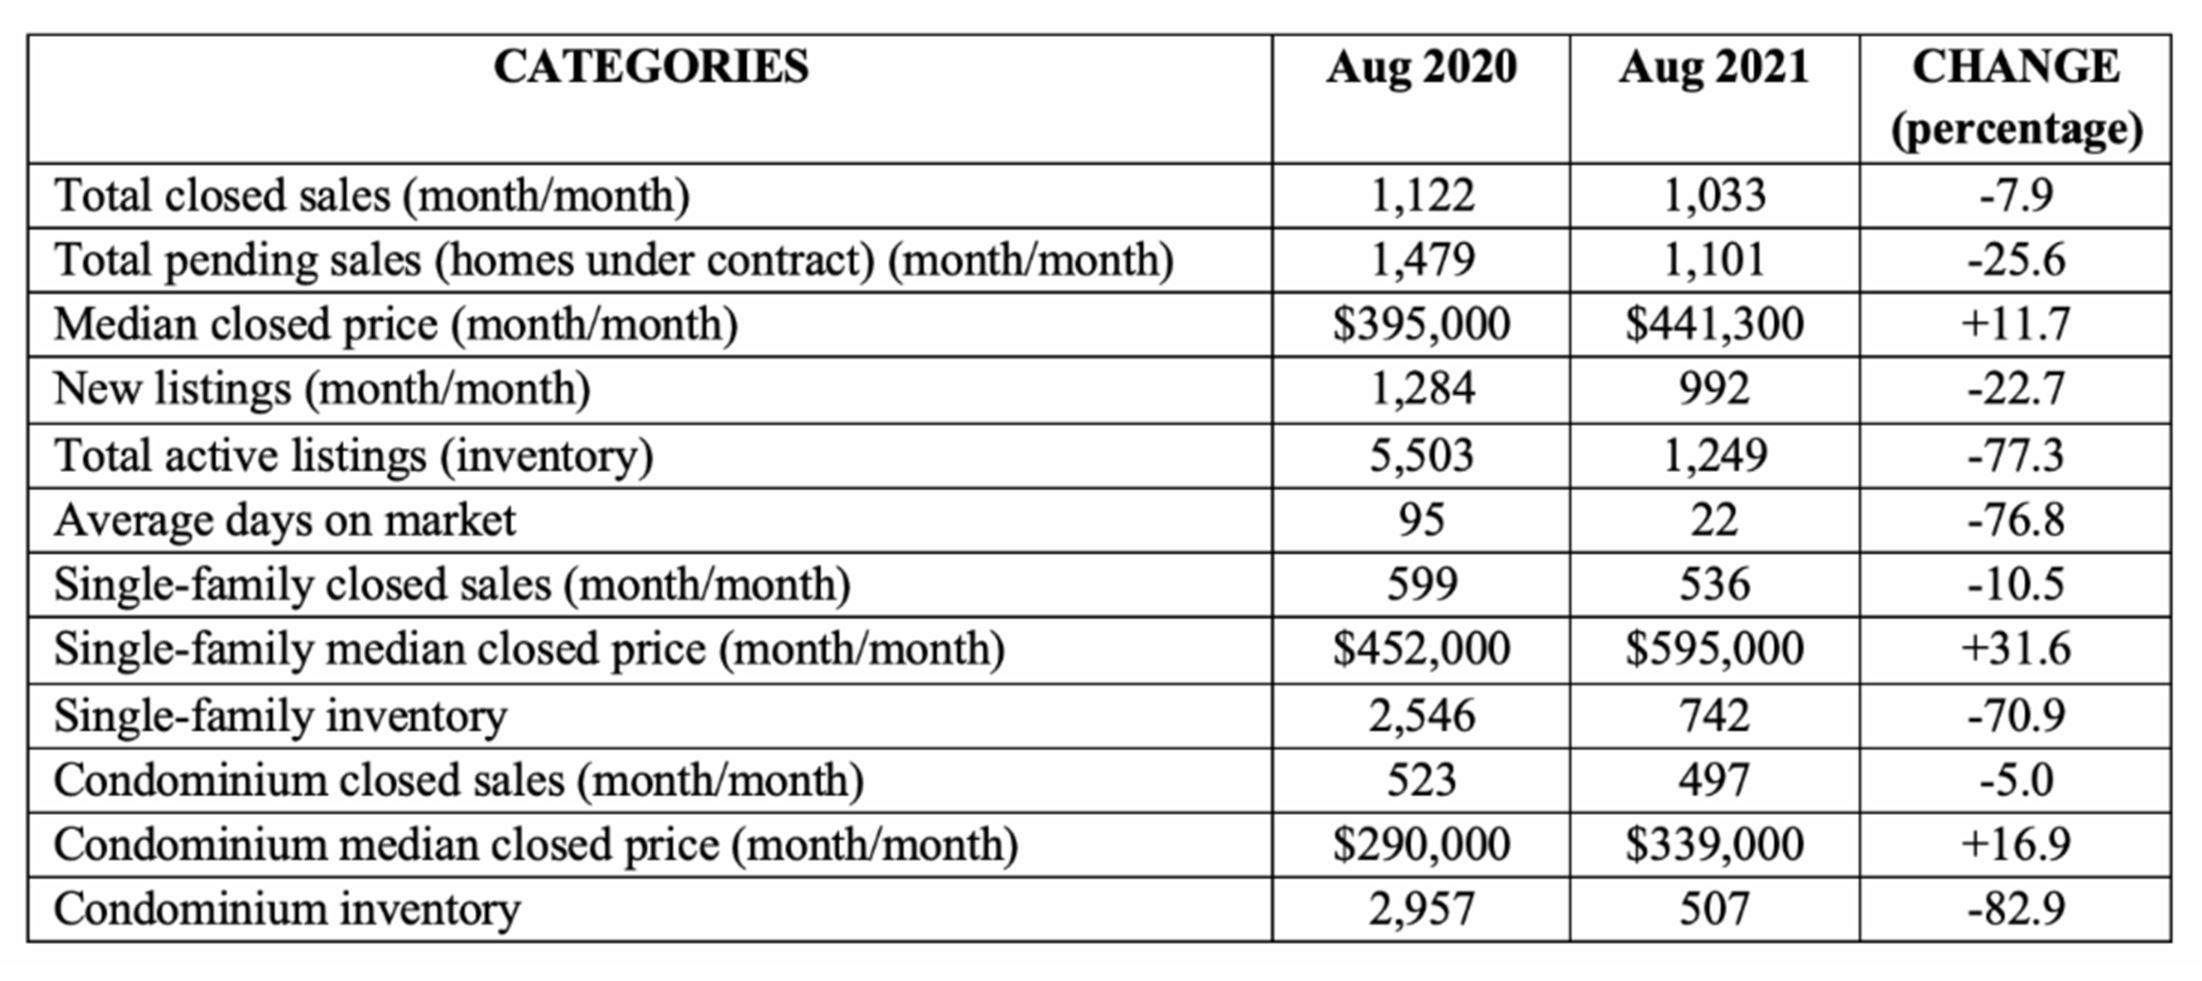 Naples Area Market Report - September 2021 infographic Breakdown August 2021 versus August 2020 Barry Hoey - Hoey Team 239RealEstateDeals.Com LLC